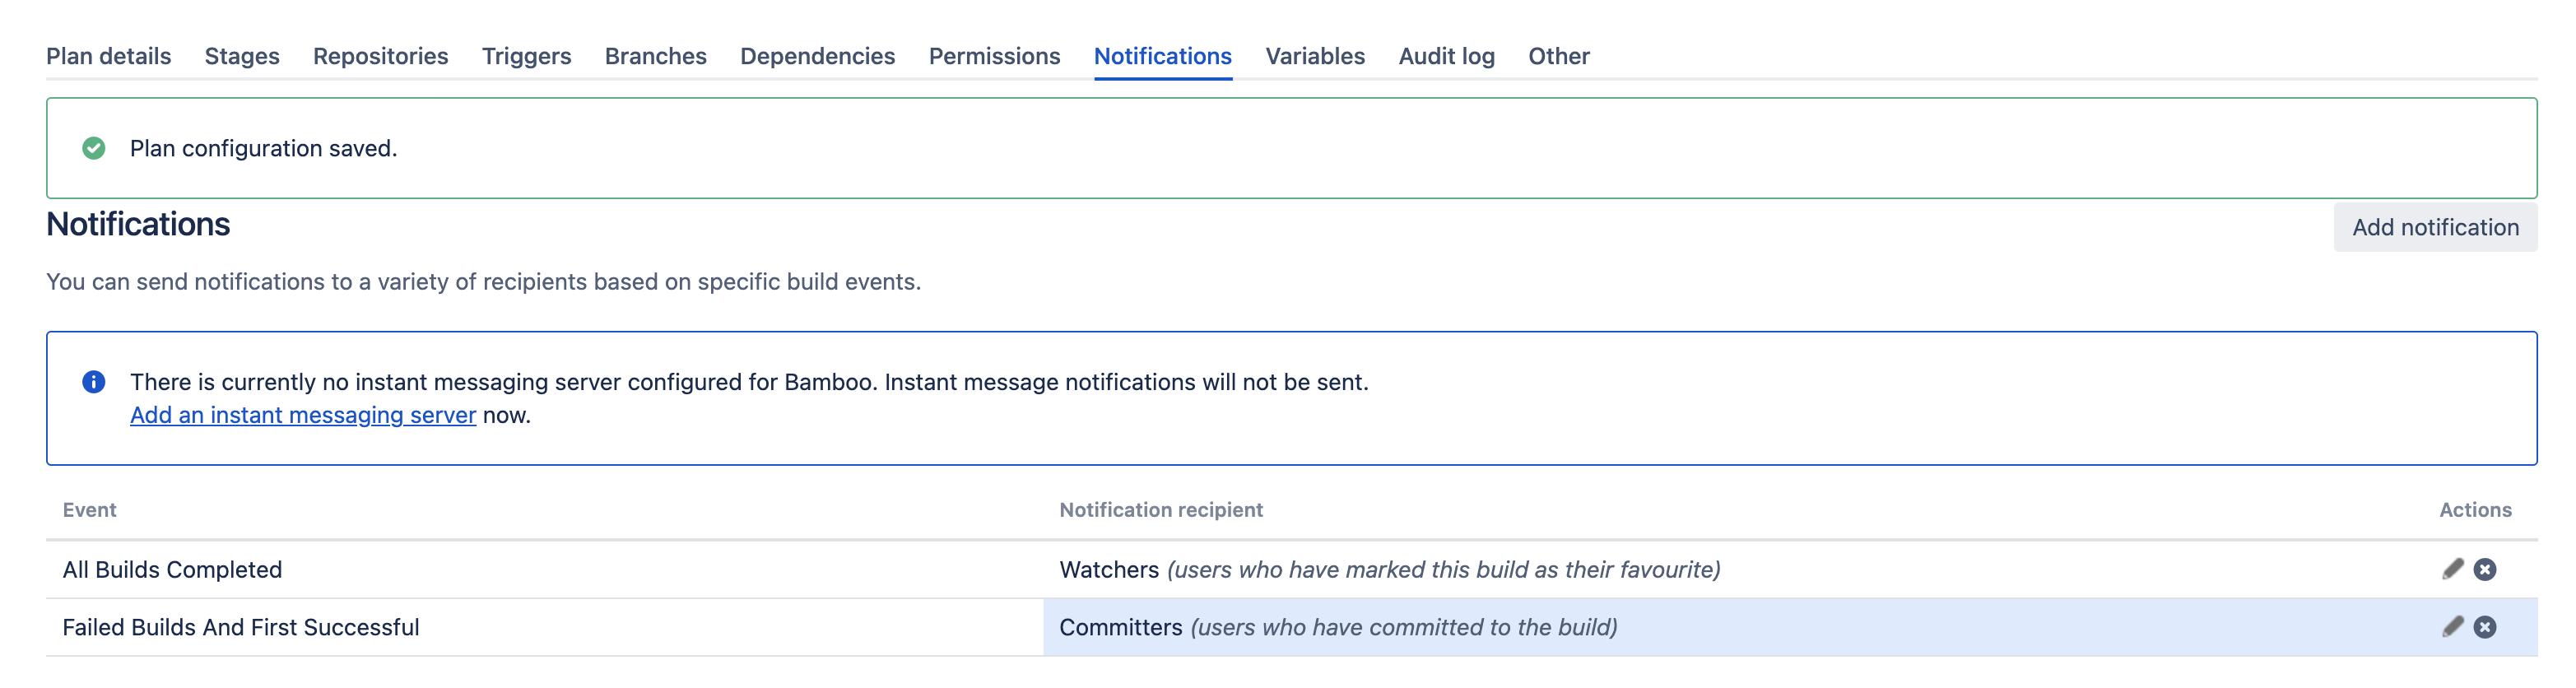 Plan notifications screen